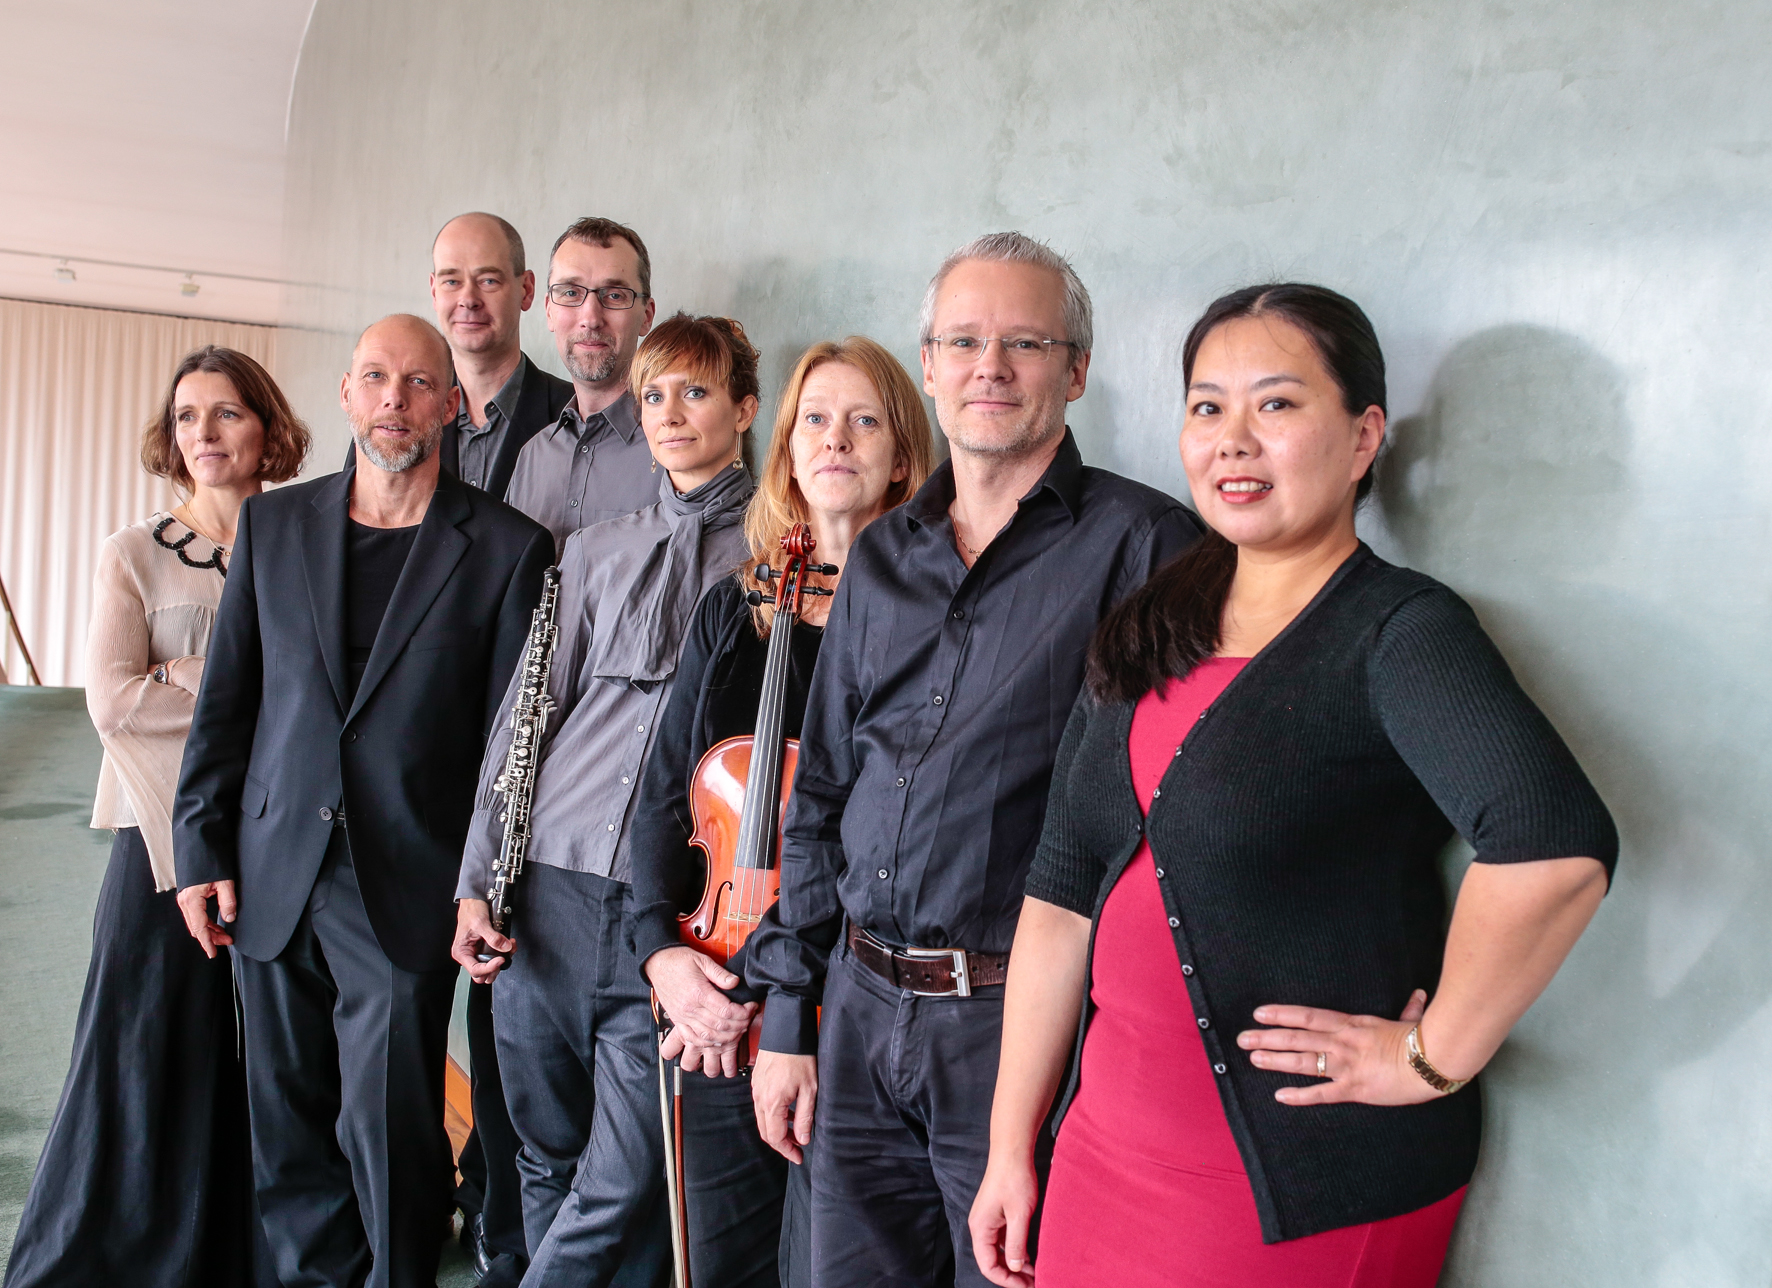 2015: Ensemblen Gageego! i Göteborgs konserthus. Foto: Johan Stern